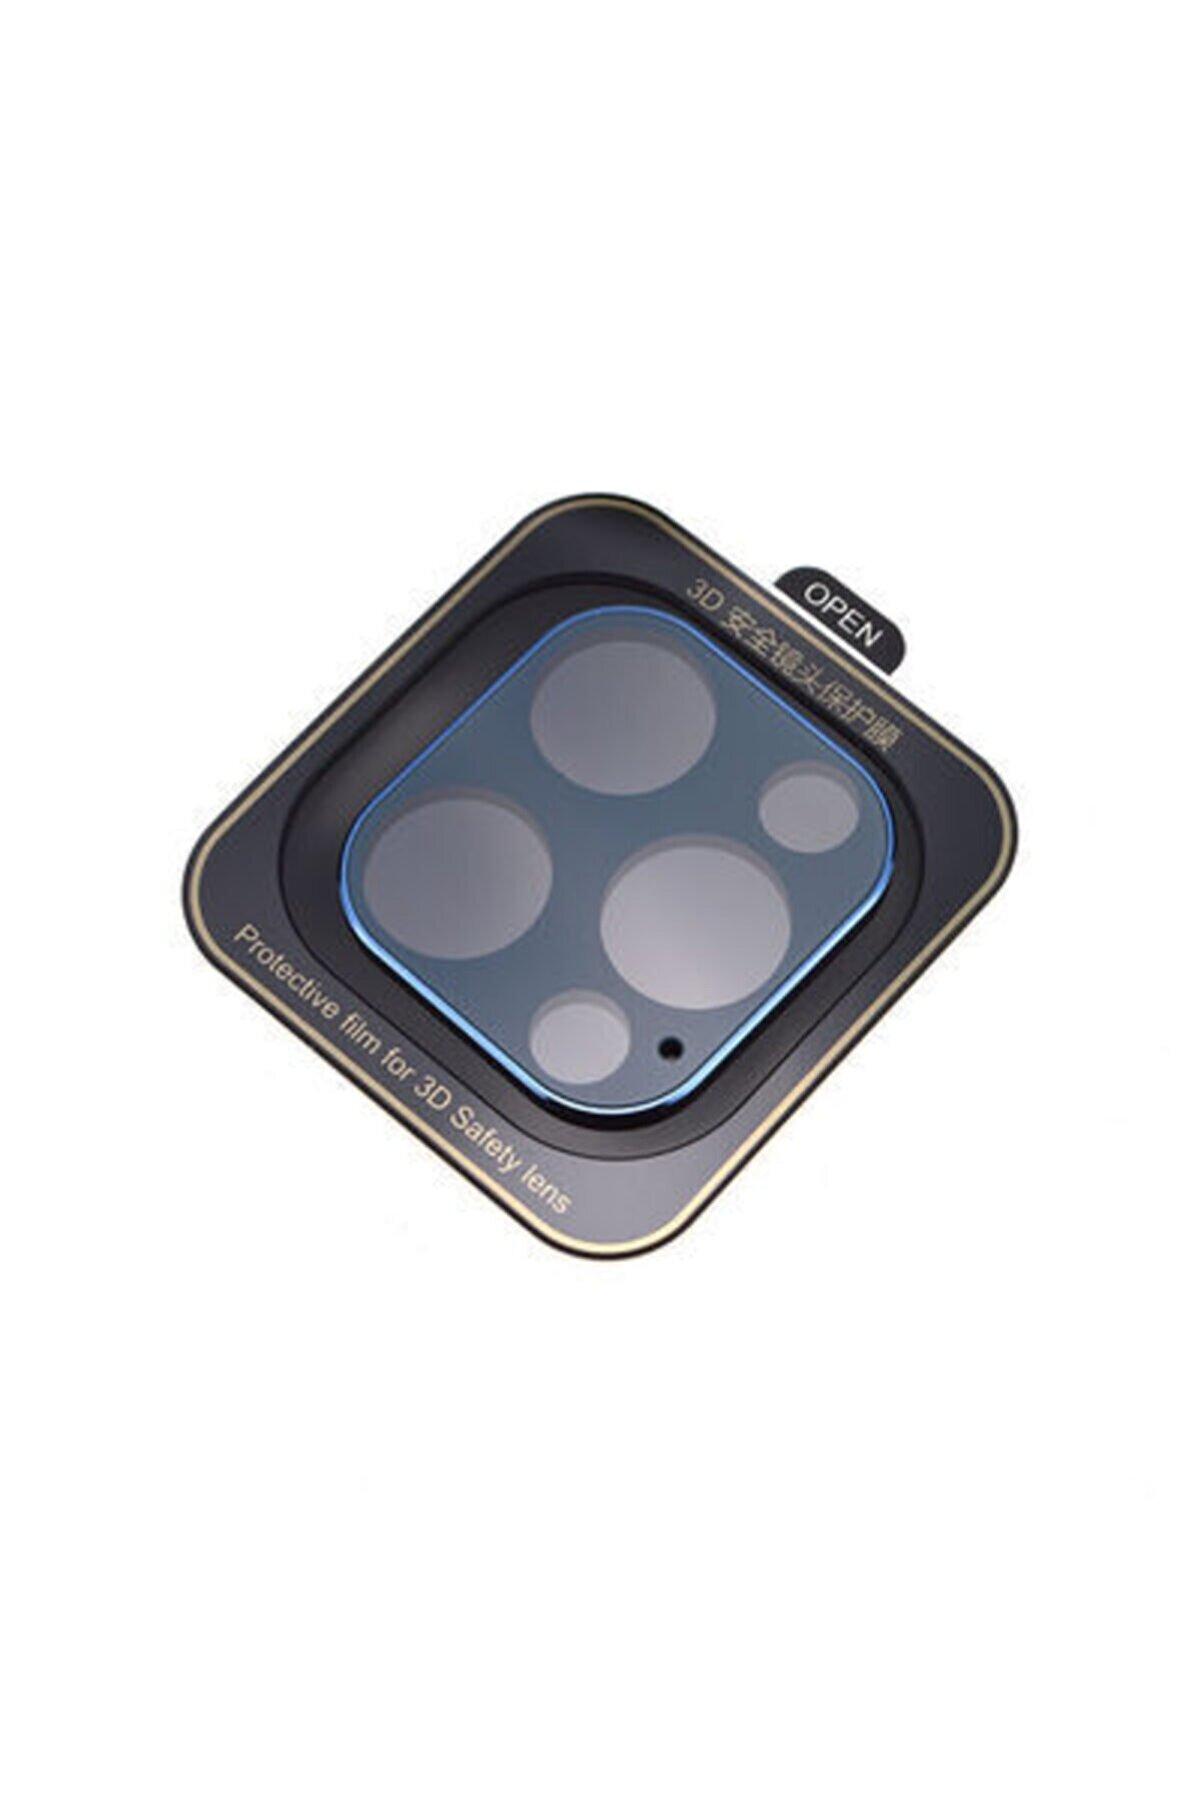 Zore Apple Iphone 12 Pro Max Kamera Koruyucu